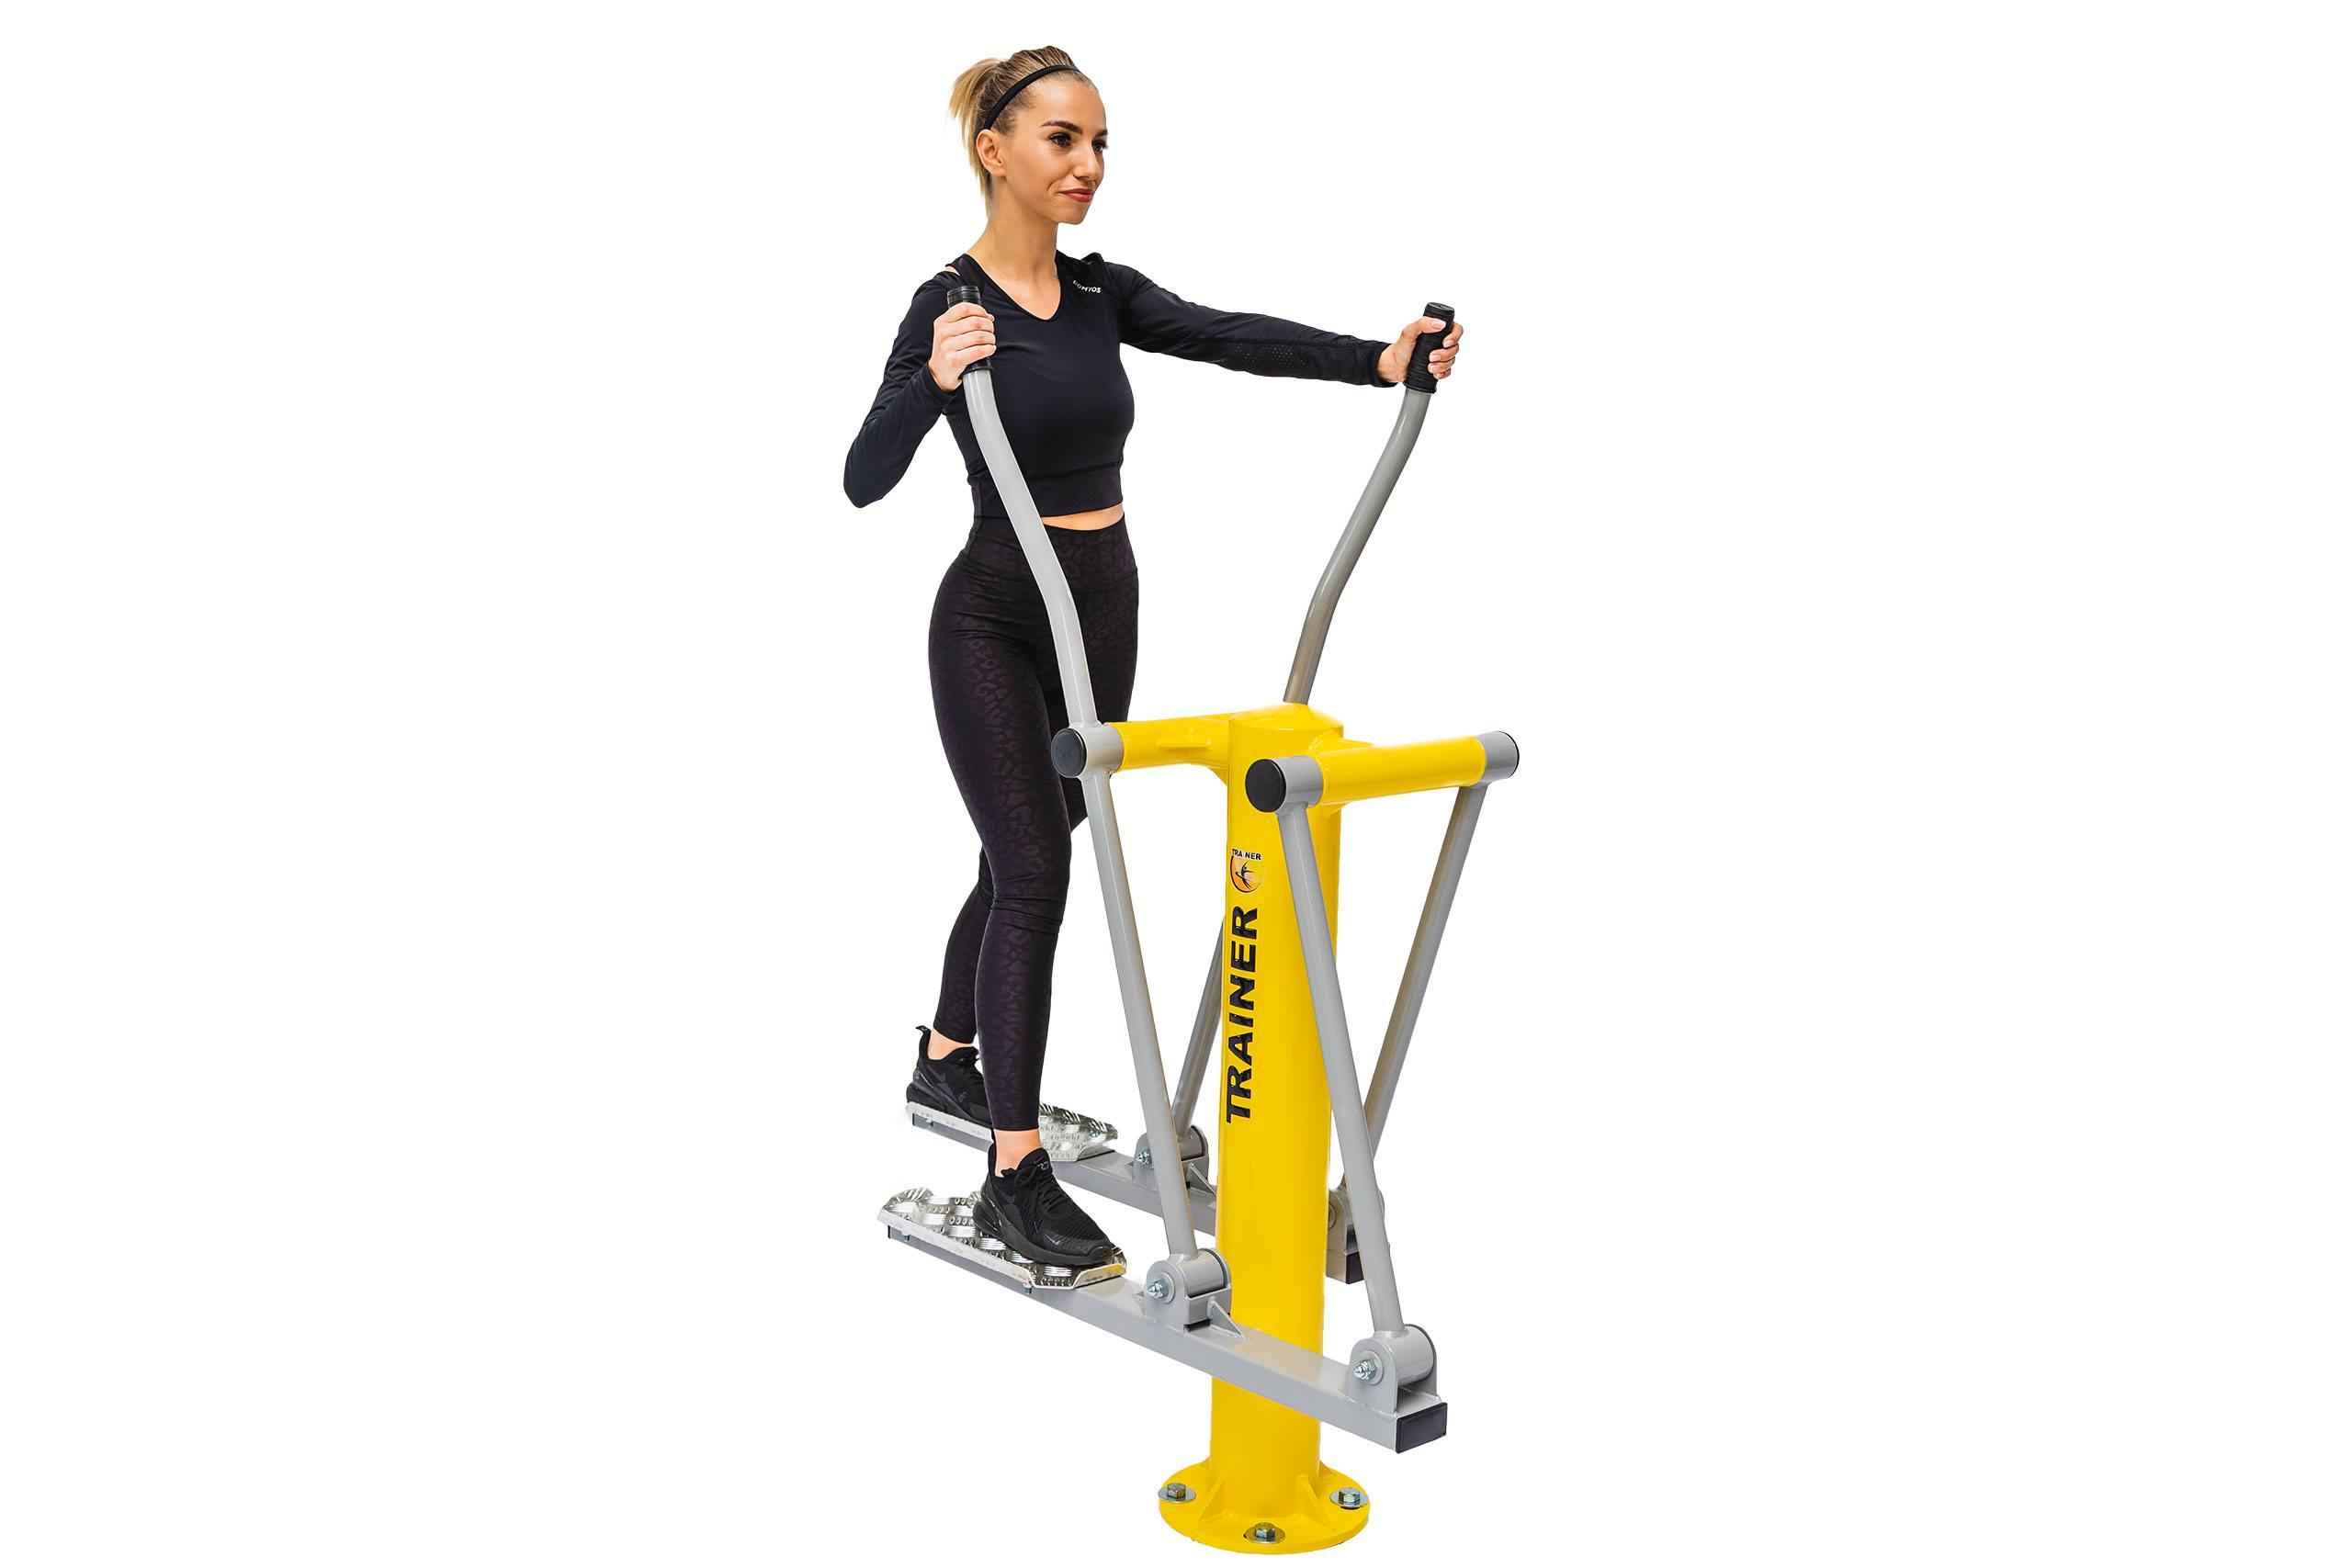 Single Ski Walking Outdoor Fitness Equipment